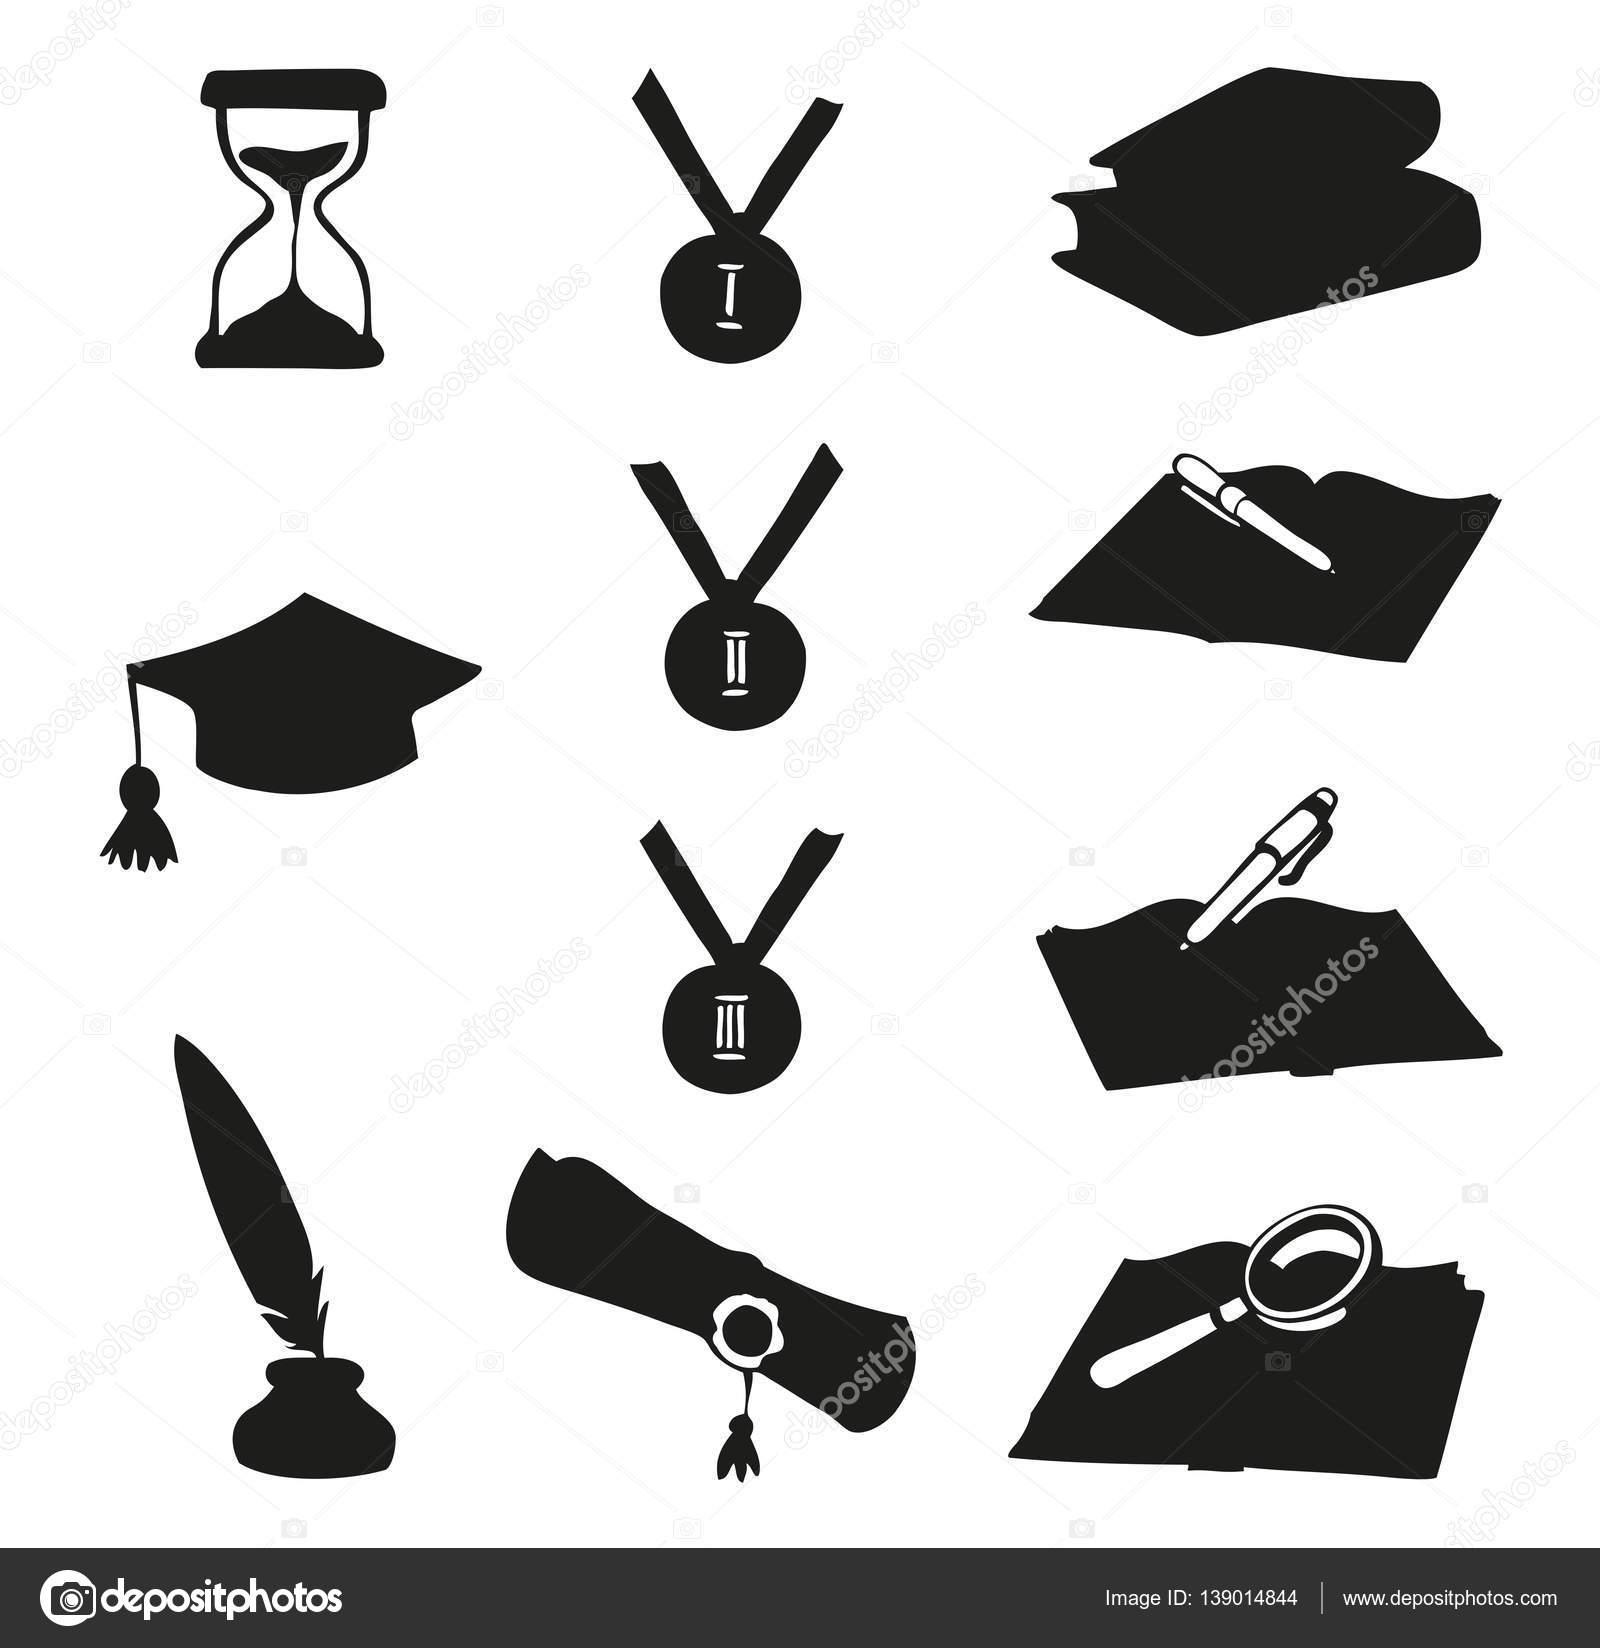 Vector Graphic Symbols Of Education Stock Vector Marinka 139014844